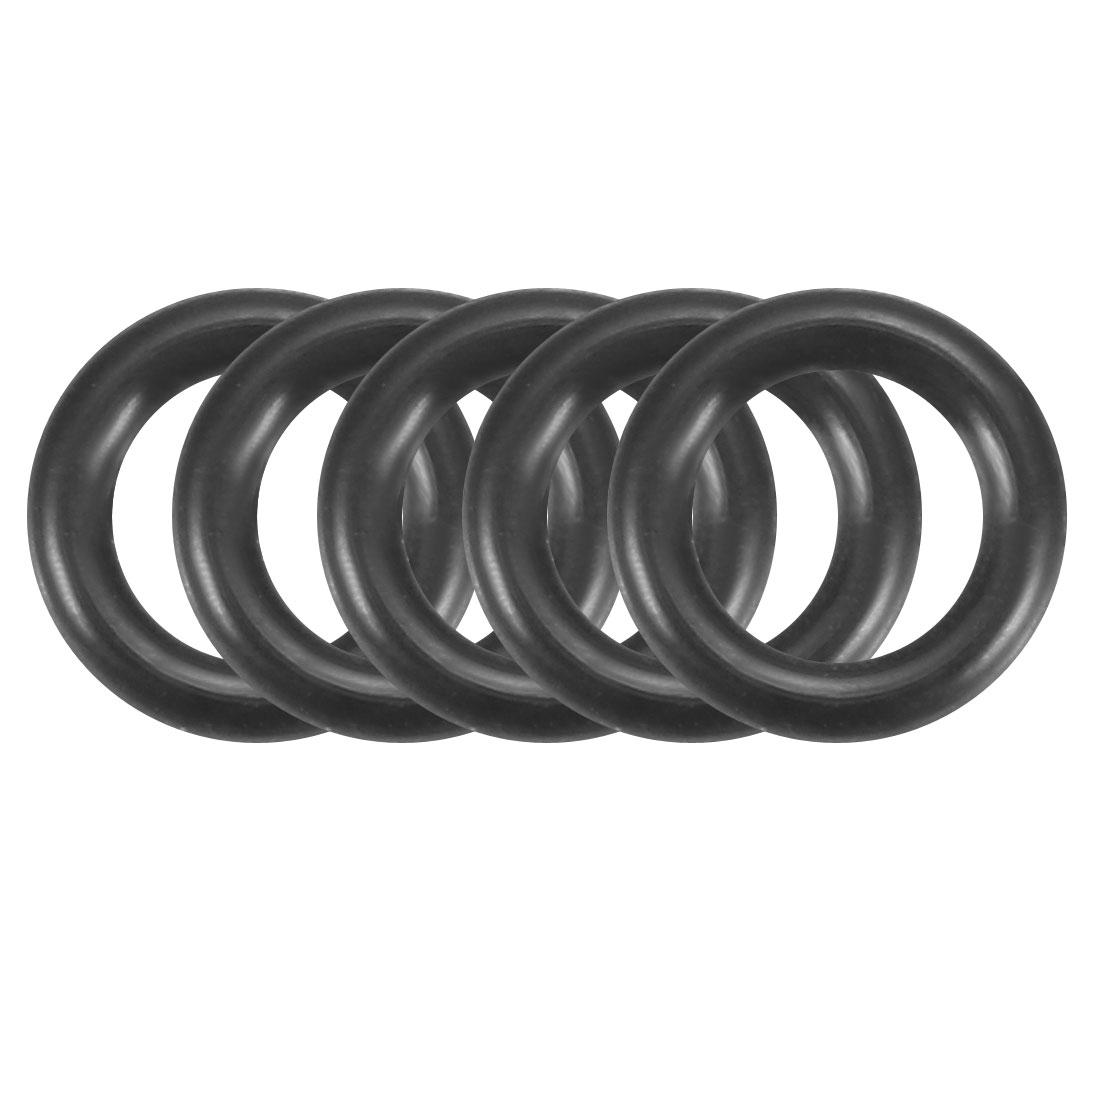 100Pcs Black 4mm x 1.2mm Nitrile Rubber O Ring NBR Oil Sealing Grommets